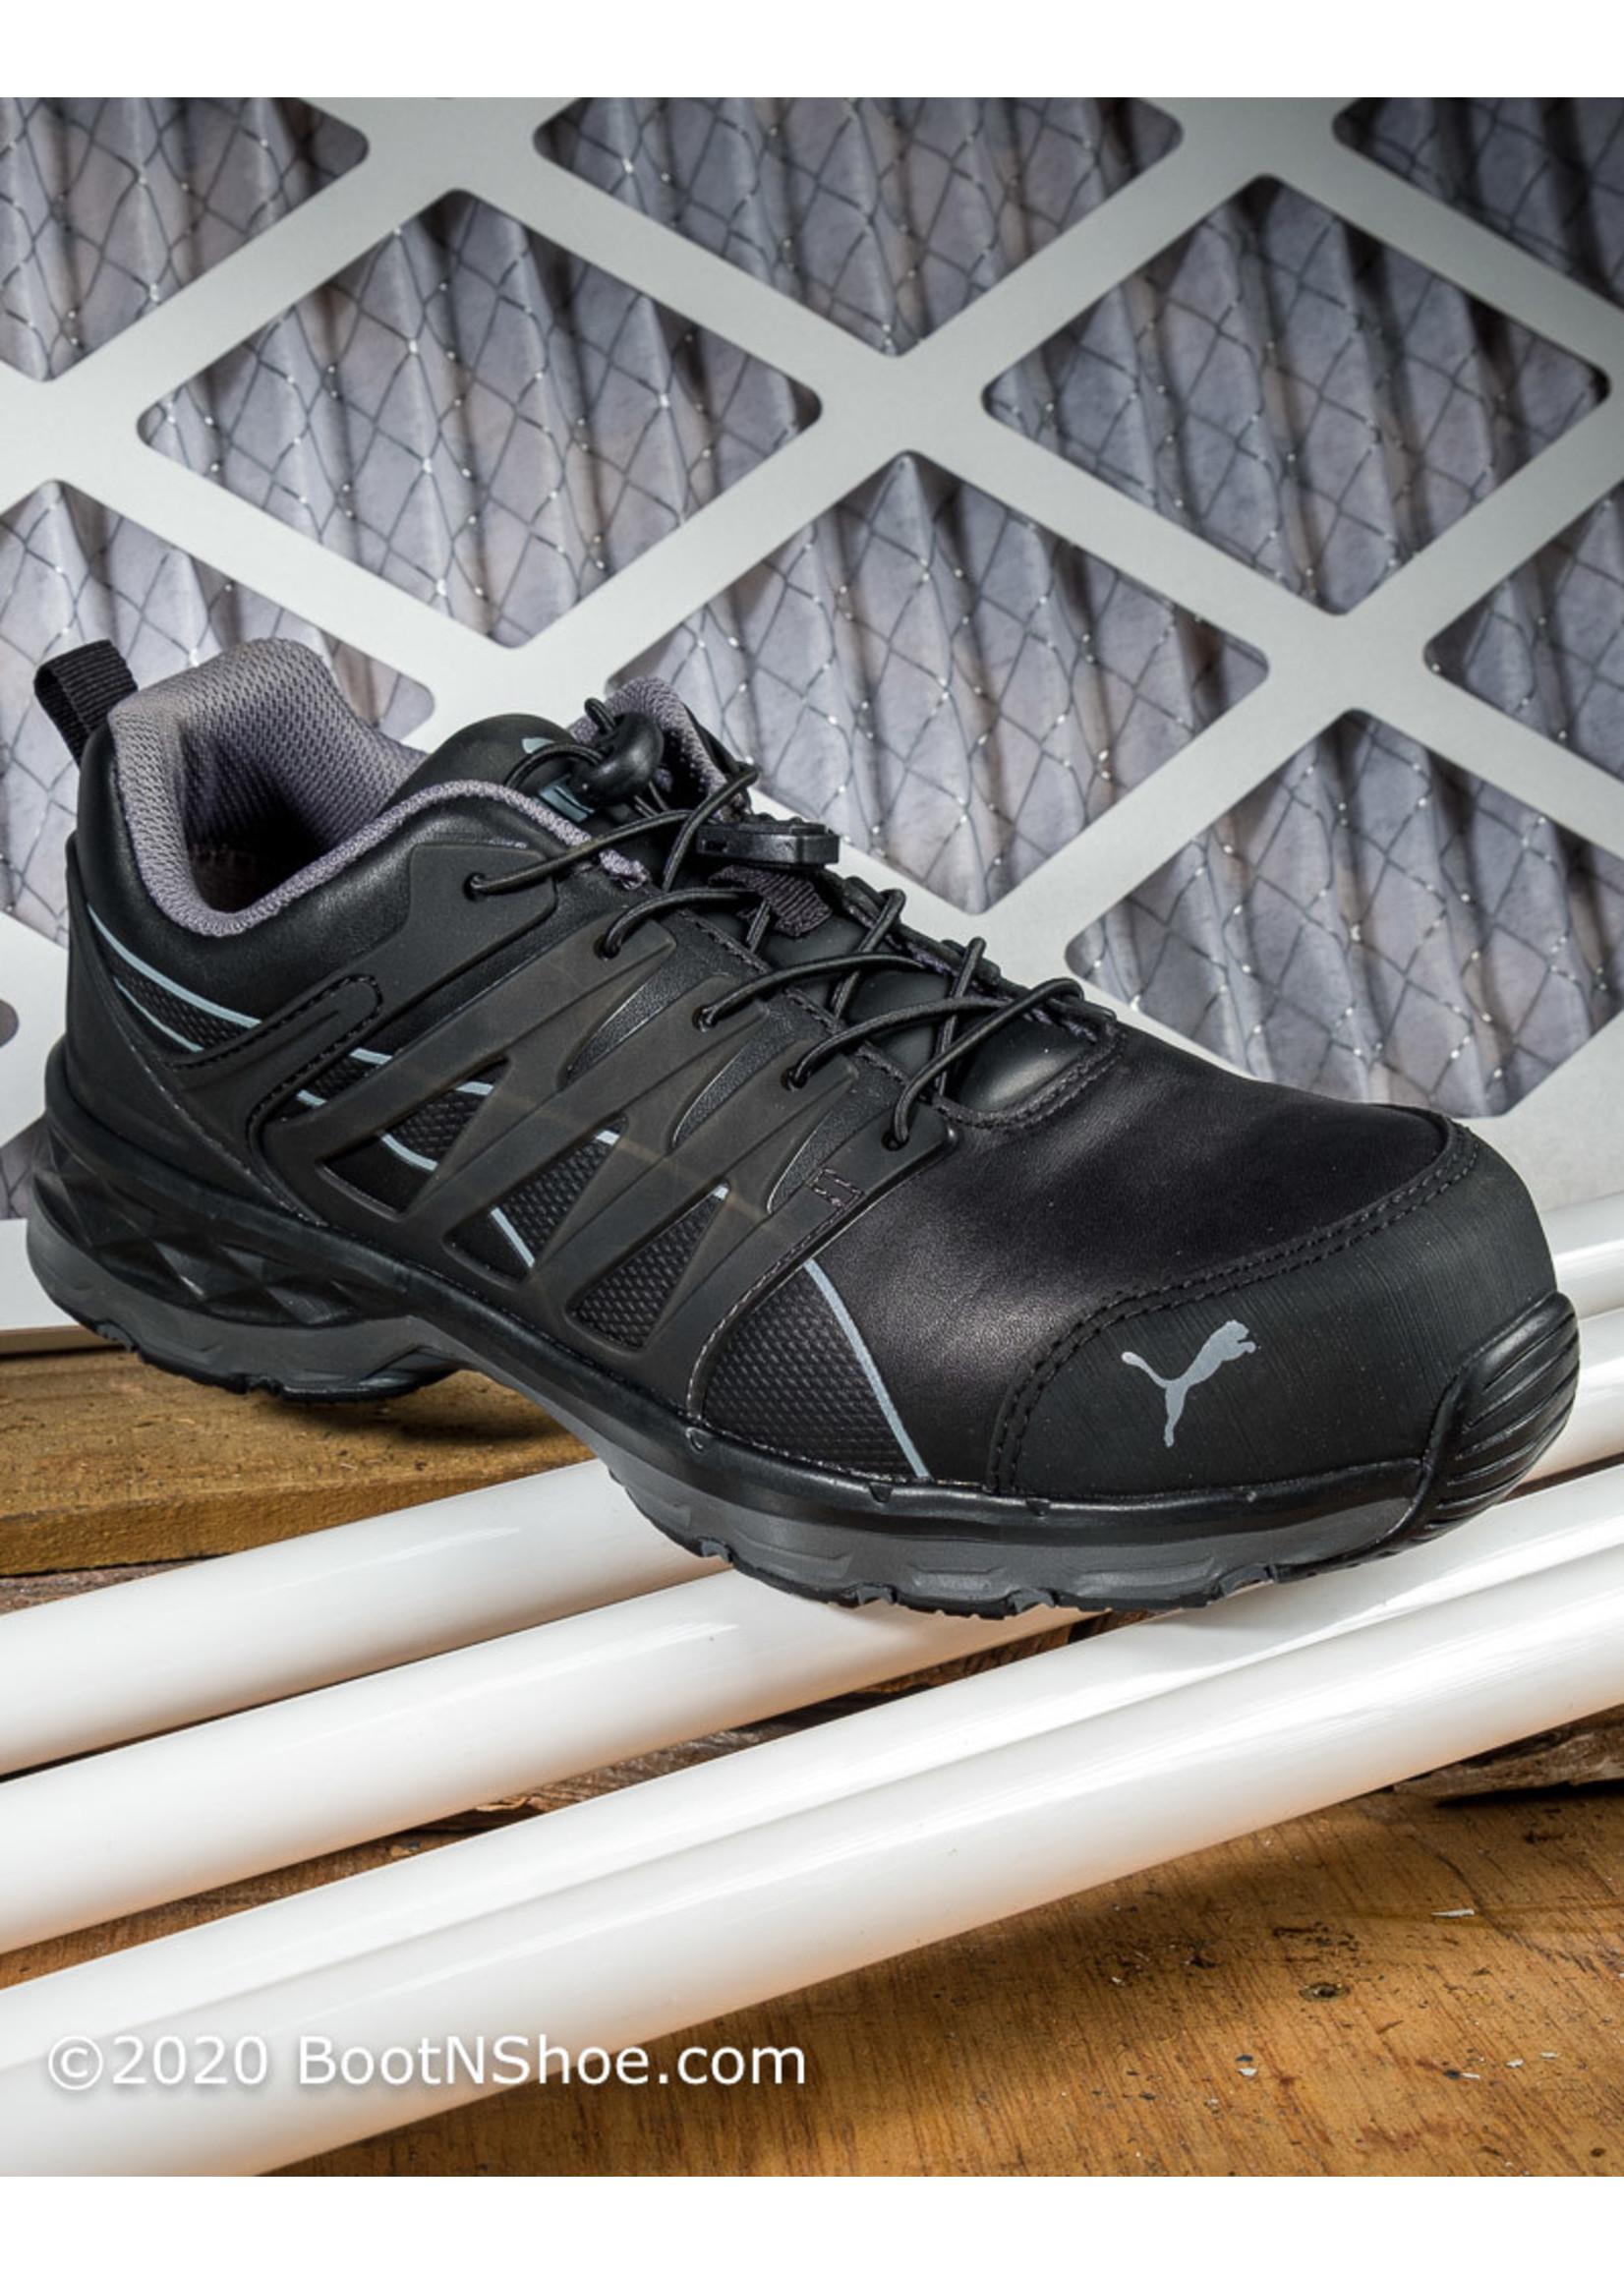 Puma Men's Velocity 2.0 Black Low SD Work Shoes 643845